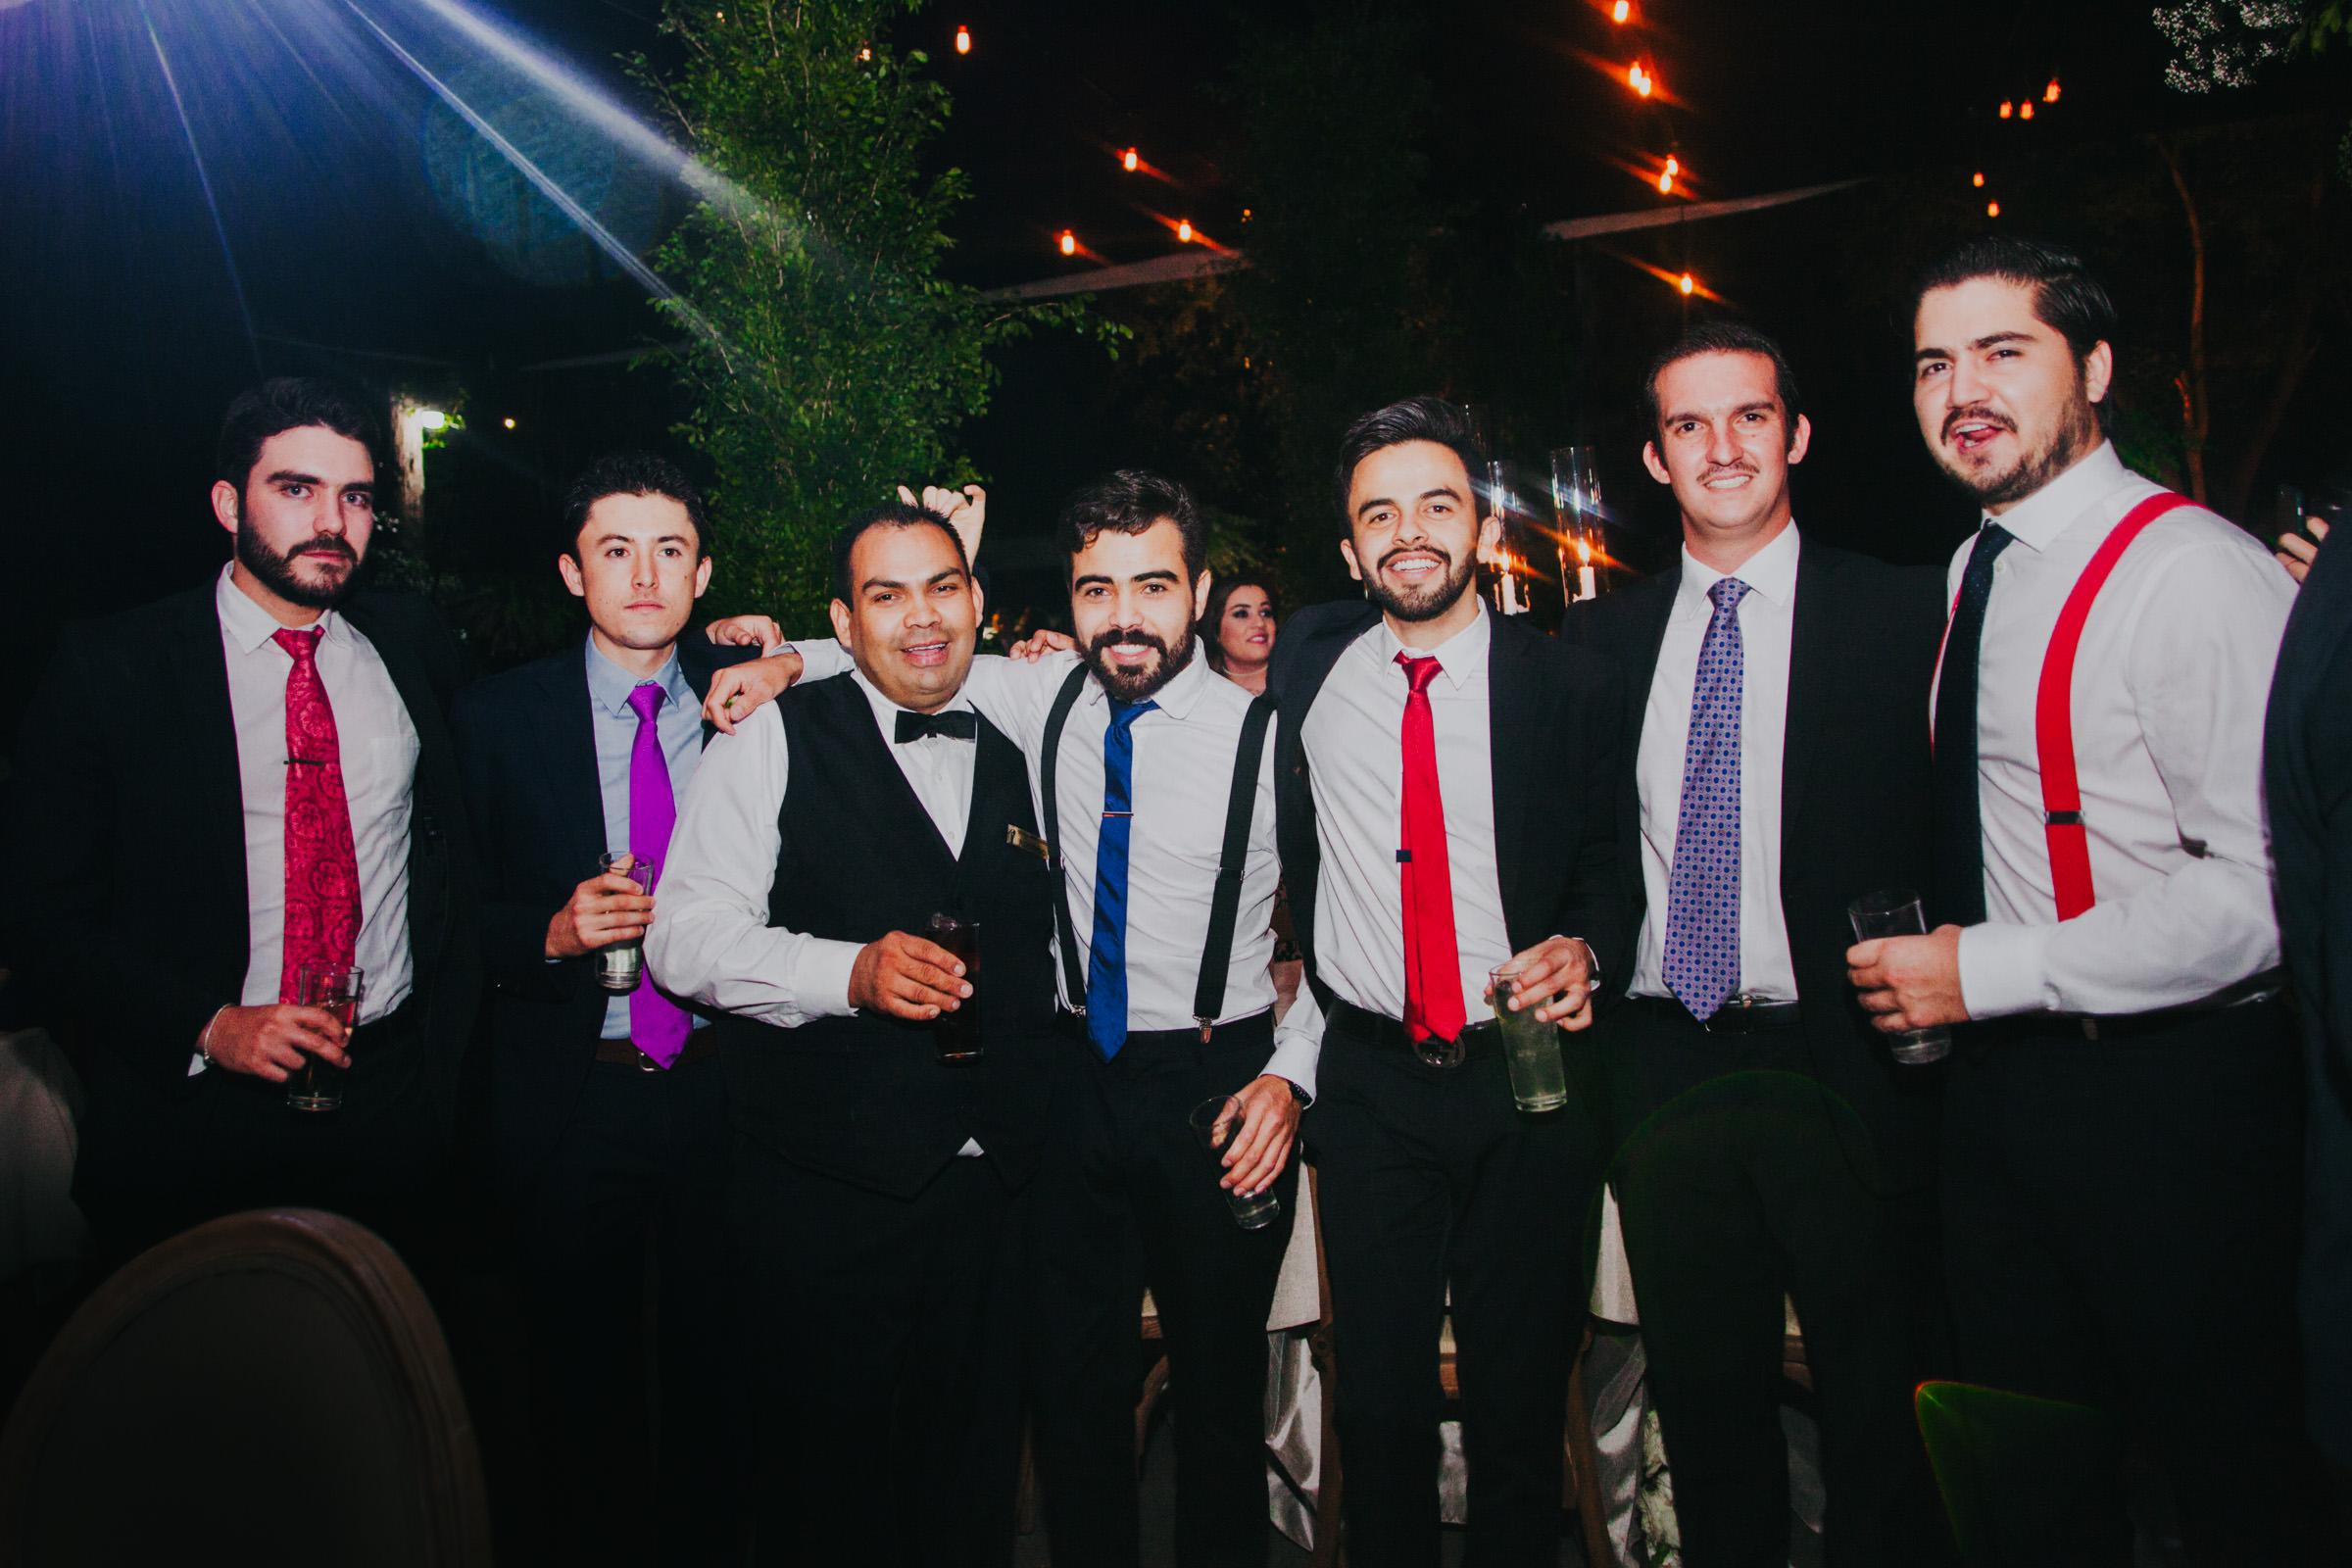 irapuato-boda-fotografia-jardines-alcalde-guanajuato-paulina-juan-pedro--164.jpg